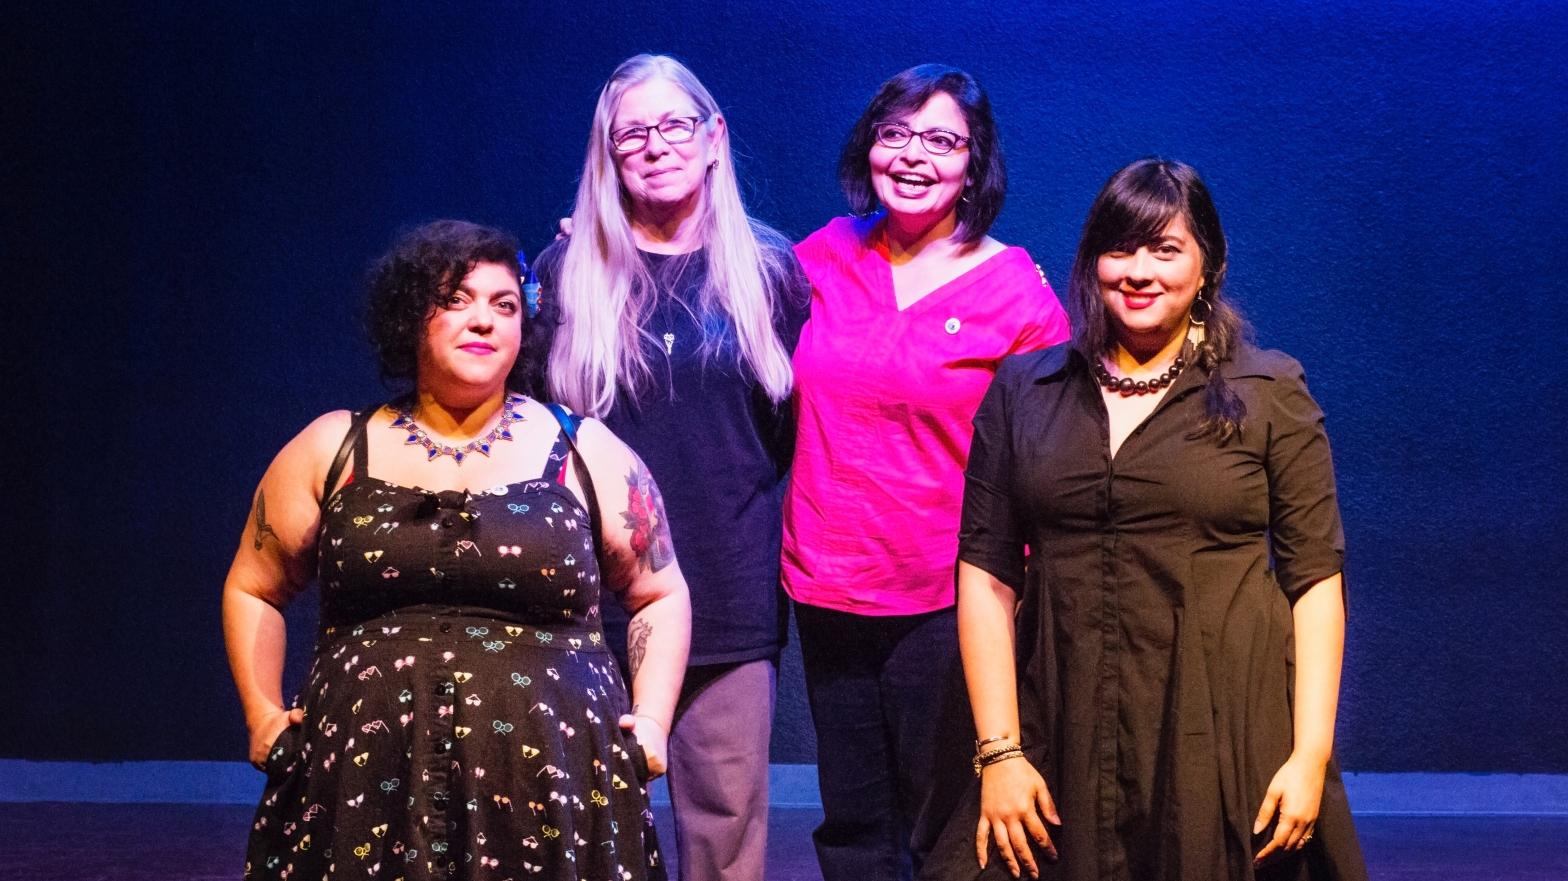 Group shot of all four readers: Randa Jarrar, Connie Hales, Samina Najmi, and Marisol Baca